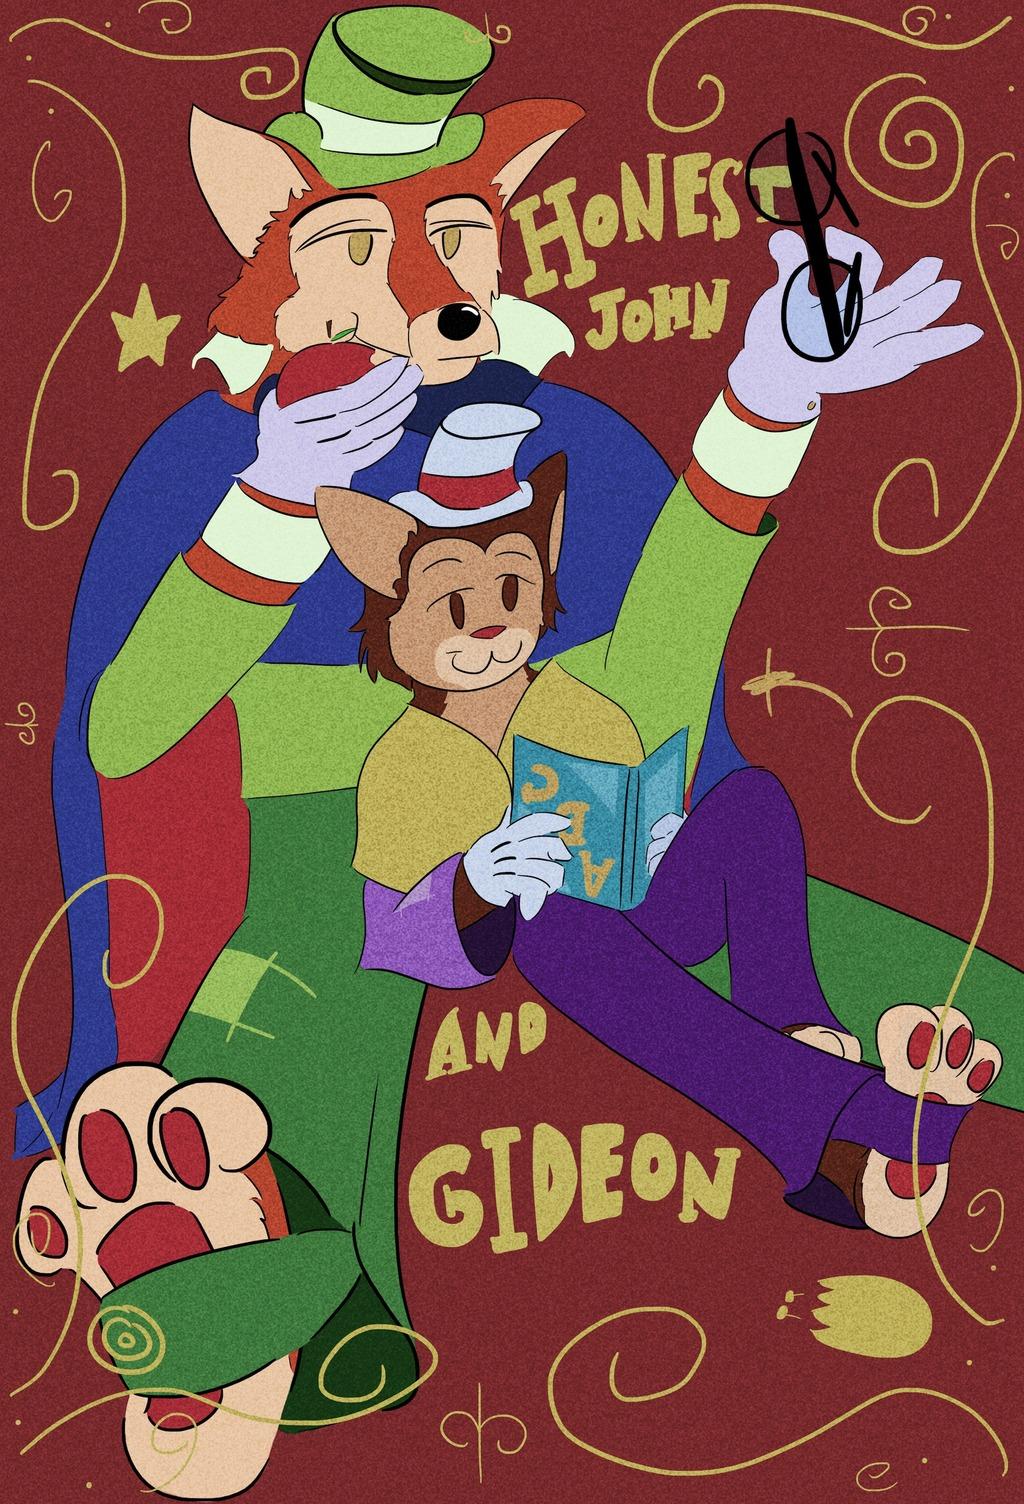 Honest John and Gideon